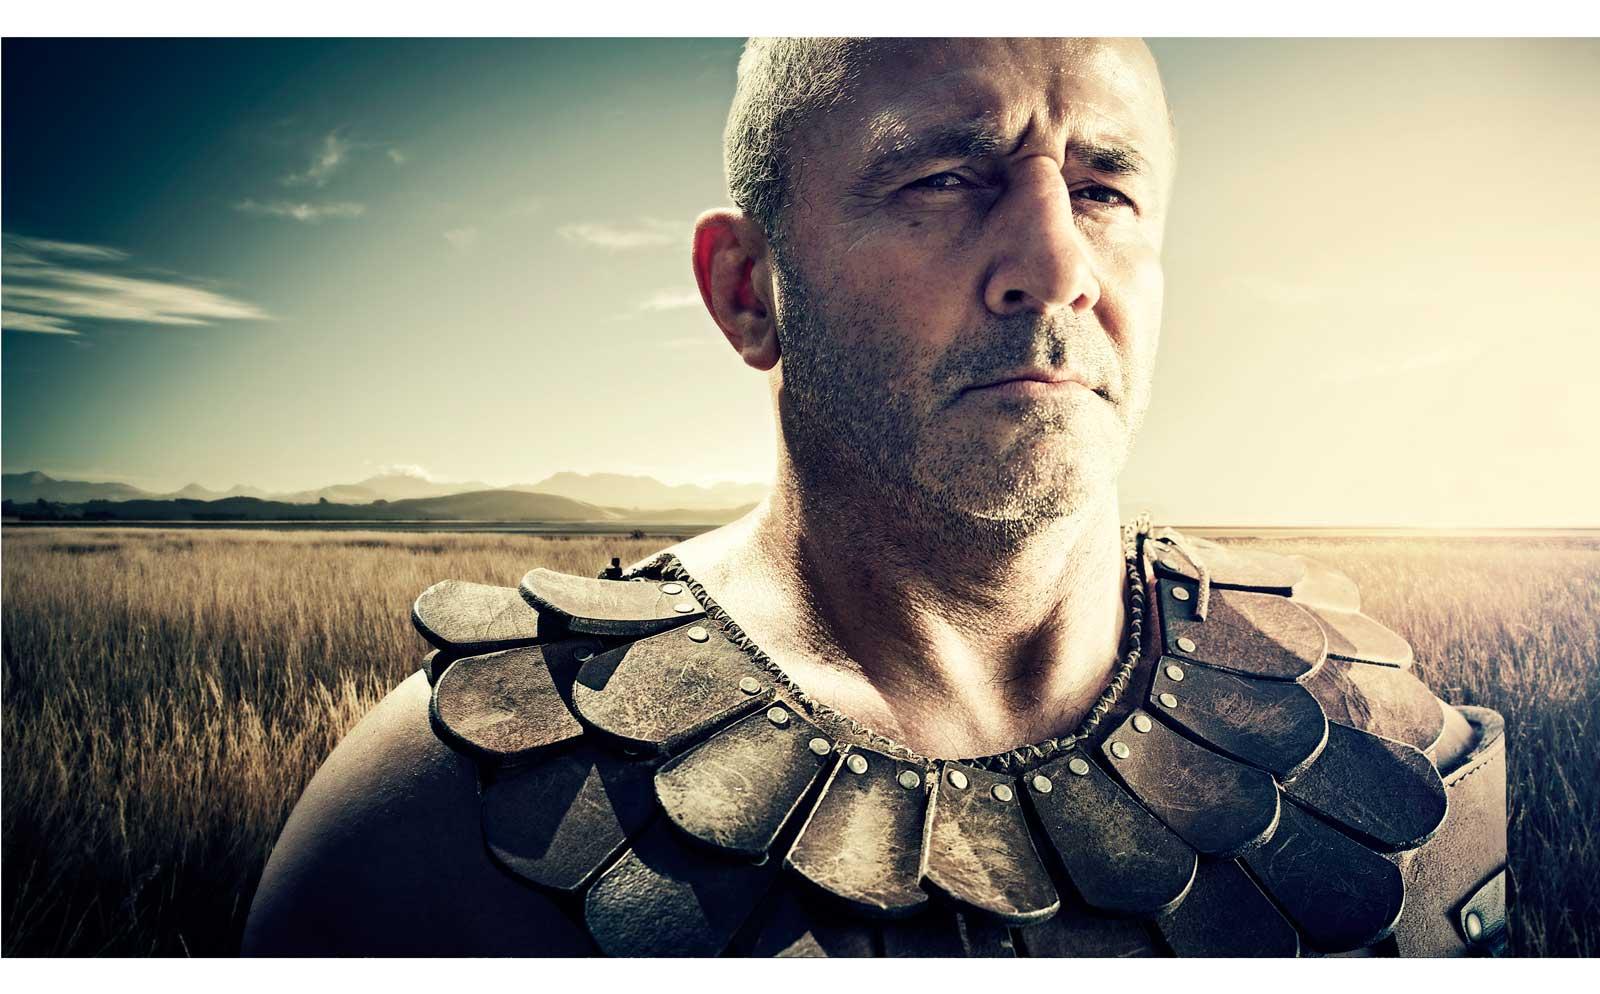 gladiator-soldado-romano-campo-field-trigo-verano